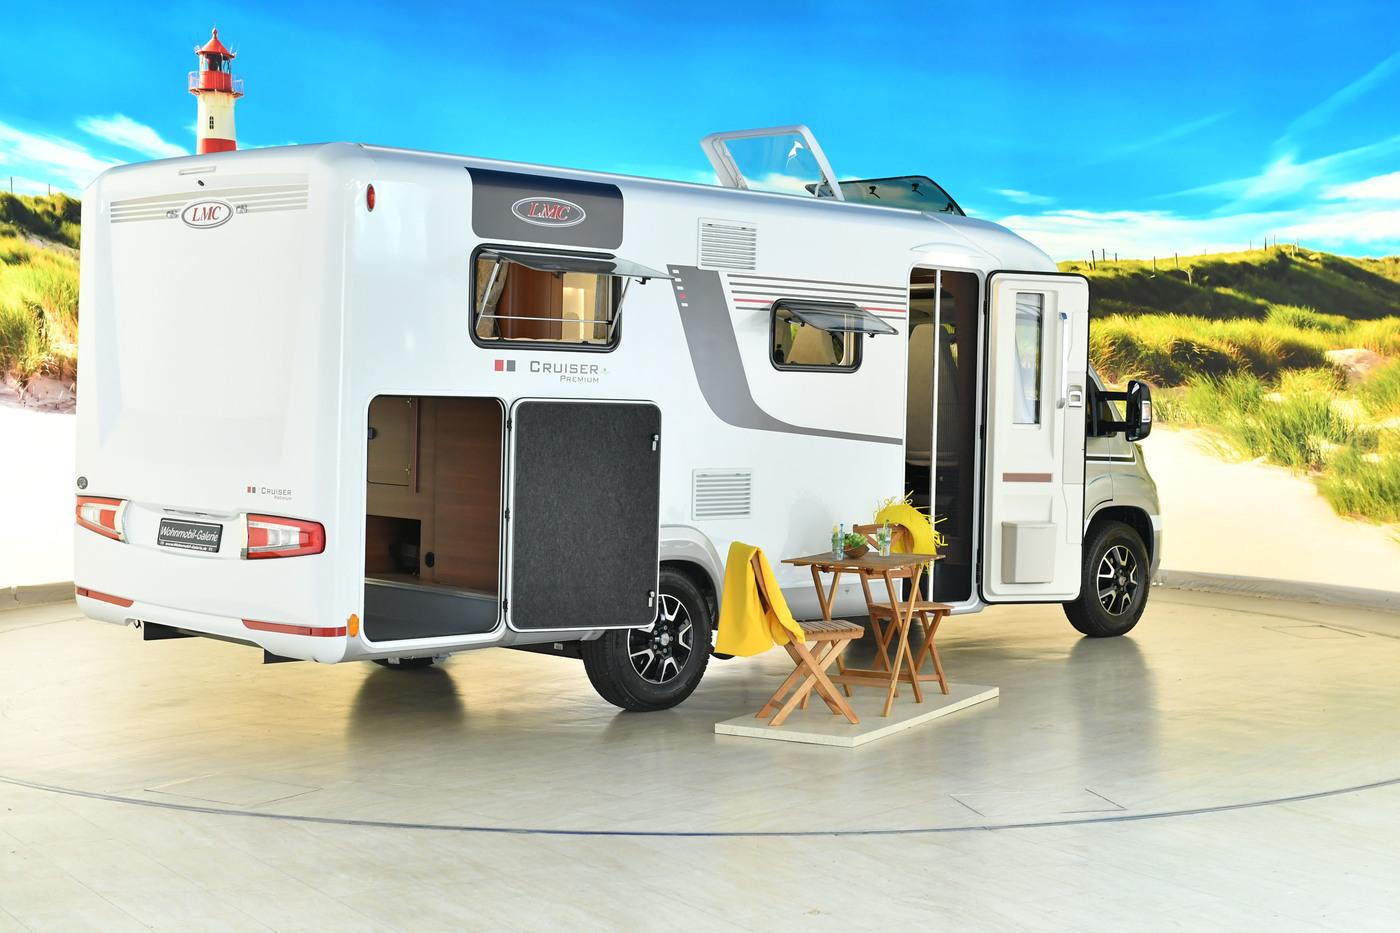 LMC - Cruiser Premium T 661 G - MJ 2019, Einzelbetten | buy used